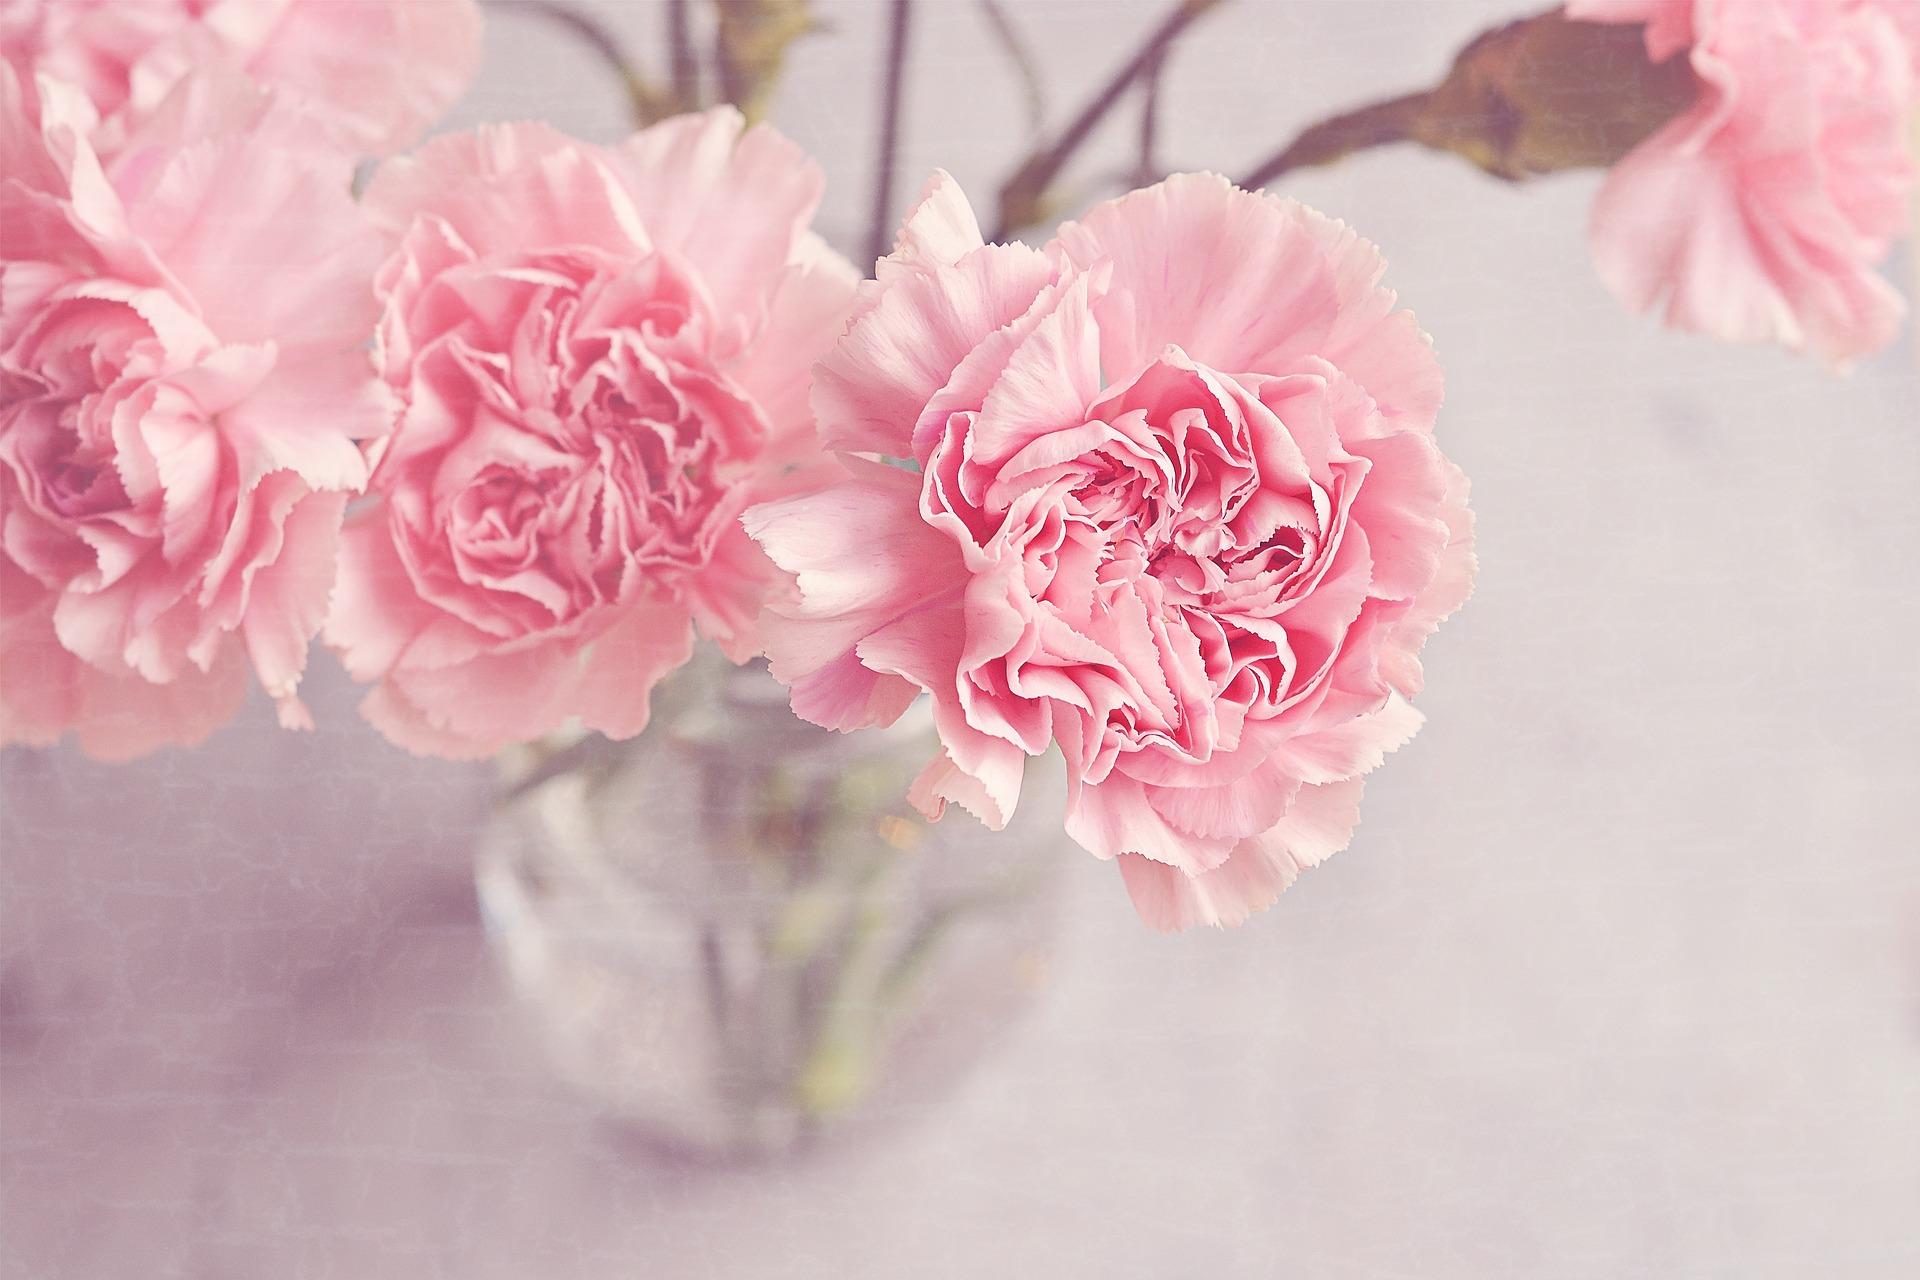 flowers-1313827_1920